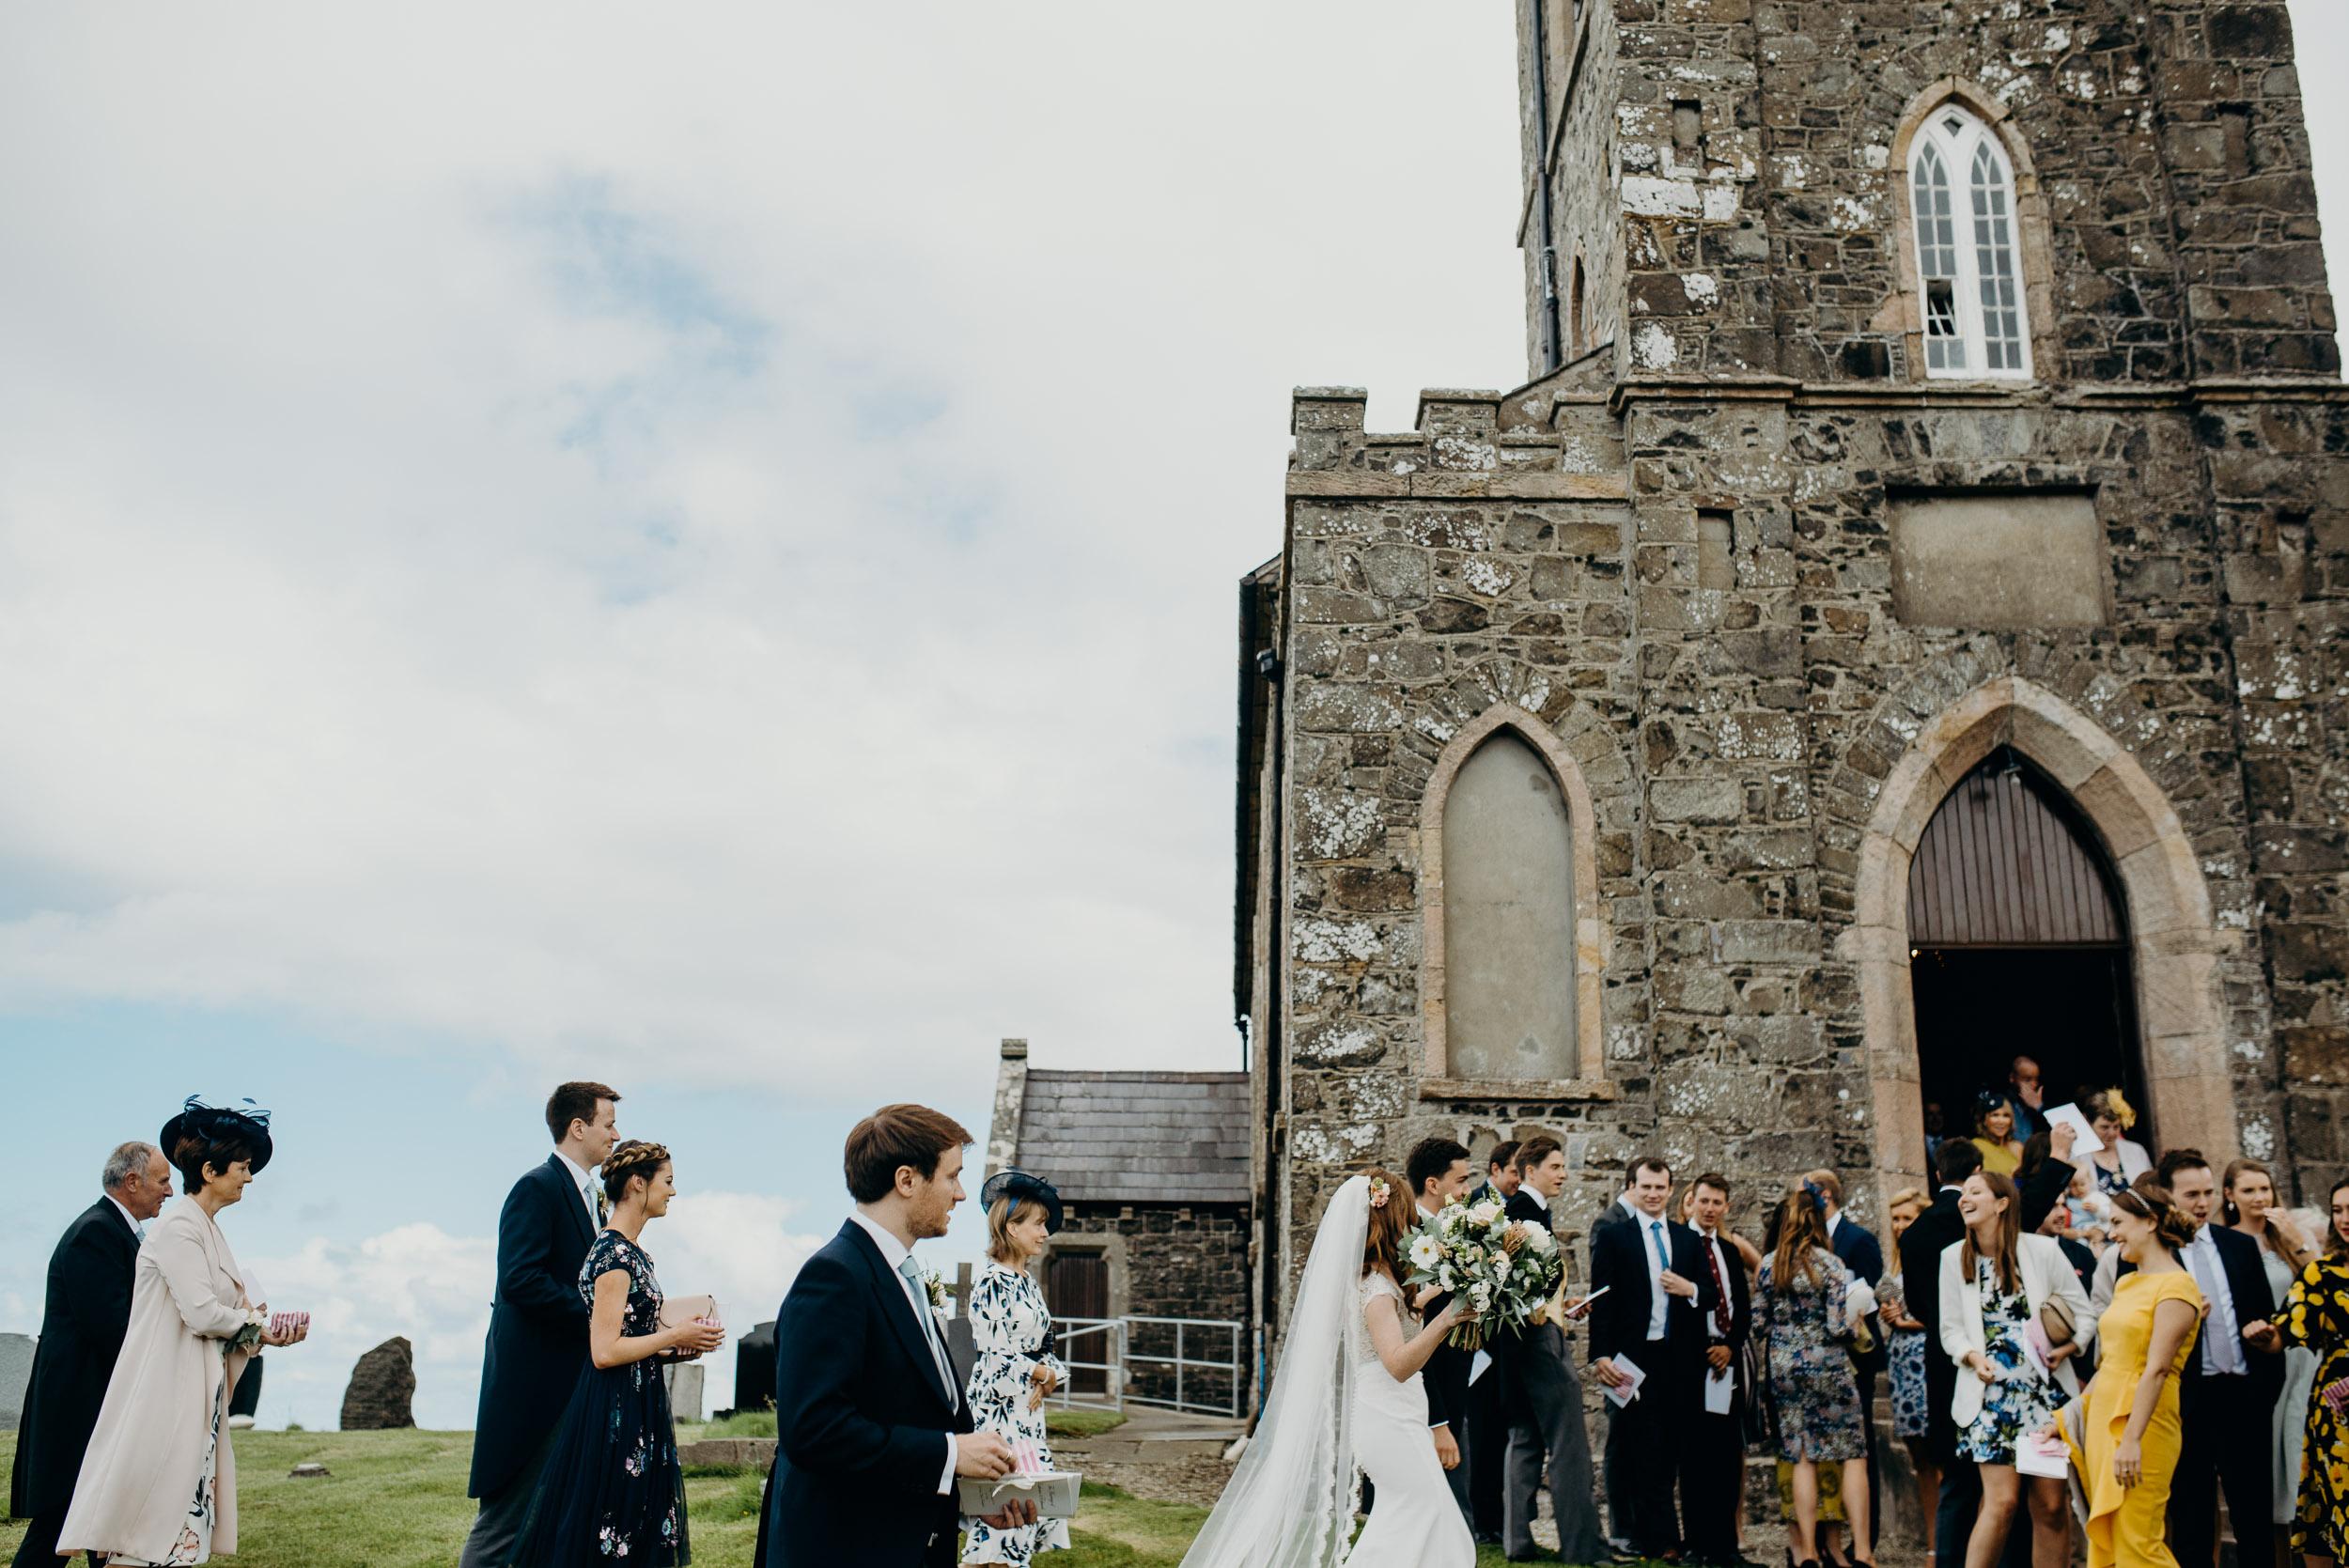 drenagh estate wedding photography-57.jpg